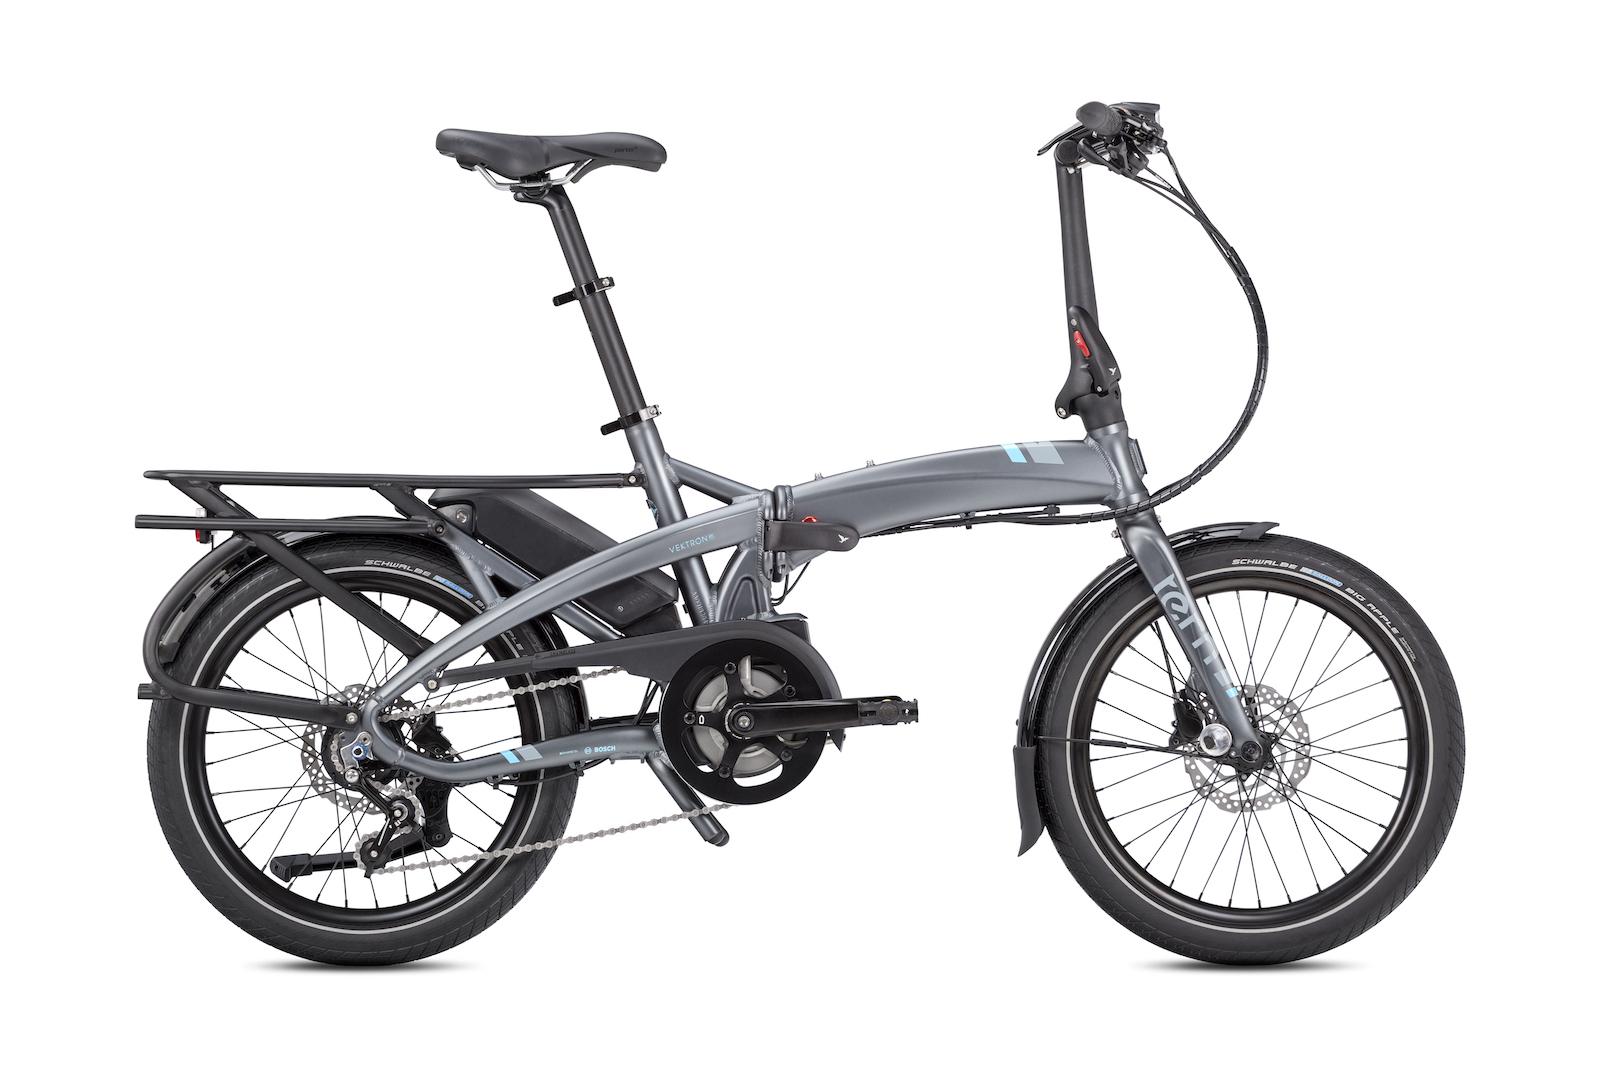 Tern Upgrades Vektron Folding eBike Line - Bike Hugger